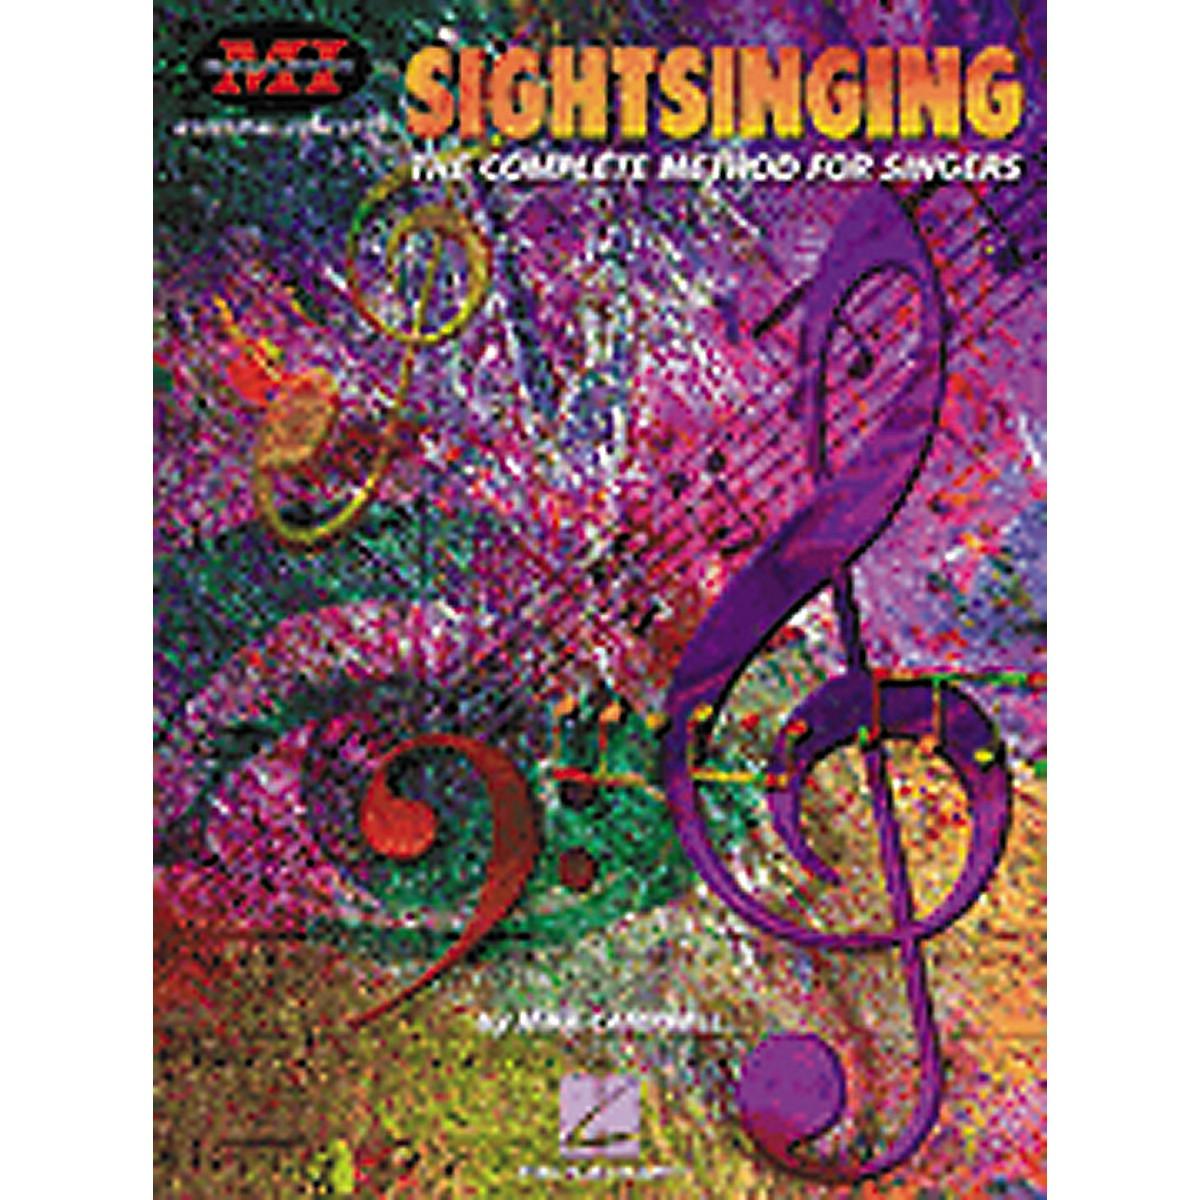 Hal Leonard Sight Singing Book The Complete Method for Singers